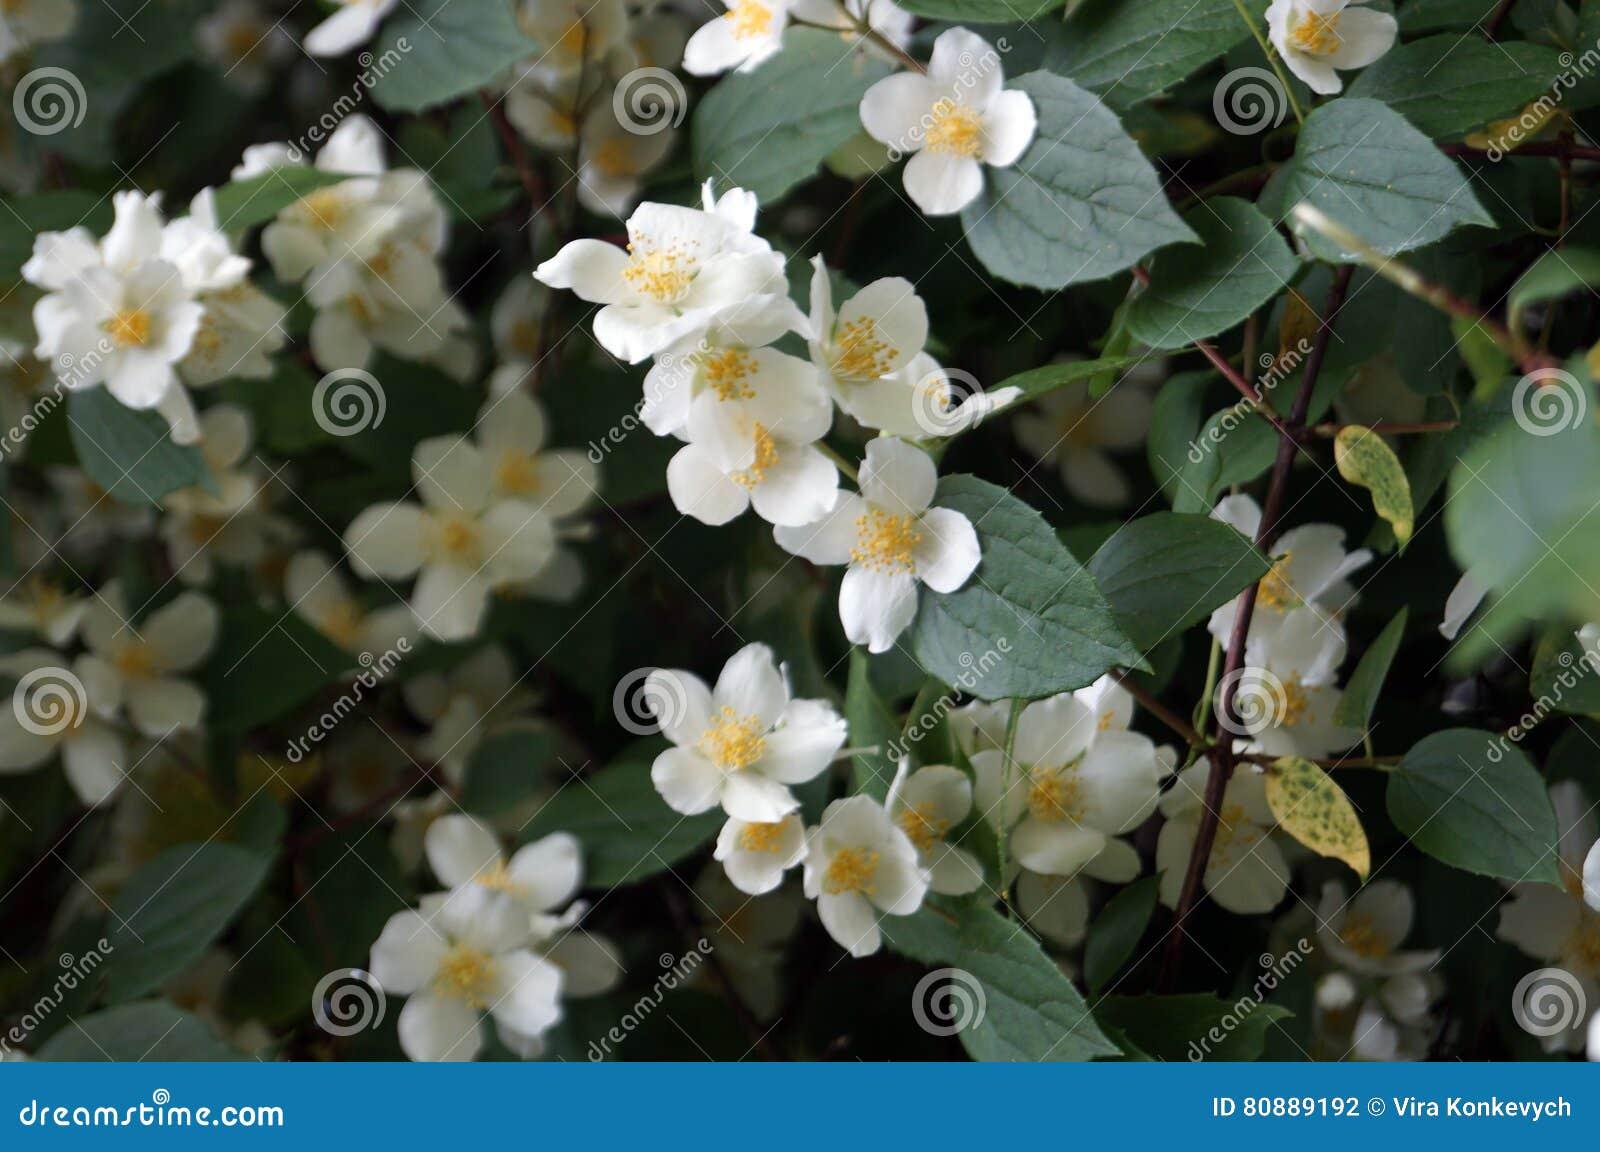 White Jasmine Flowers Stock Photo Image Of Jasmine Flowers 80889192